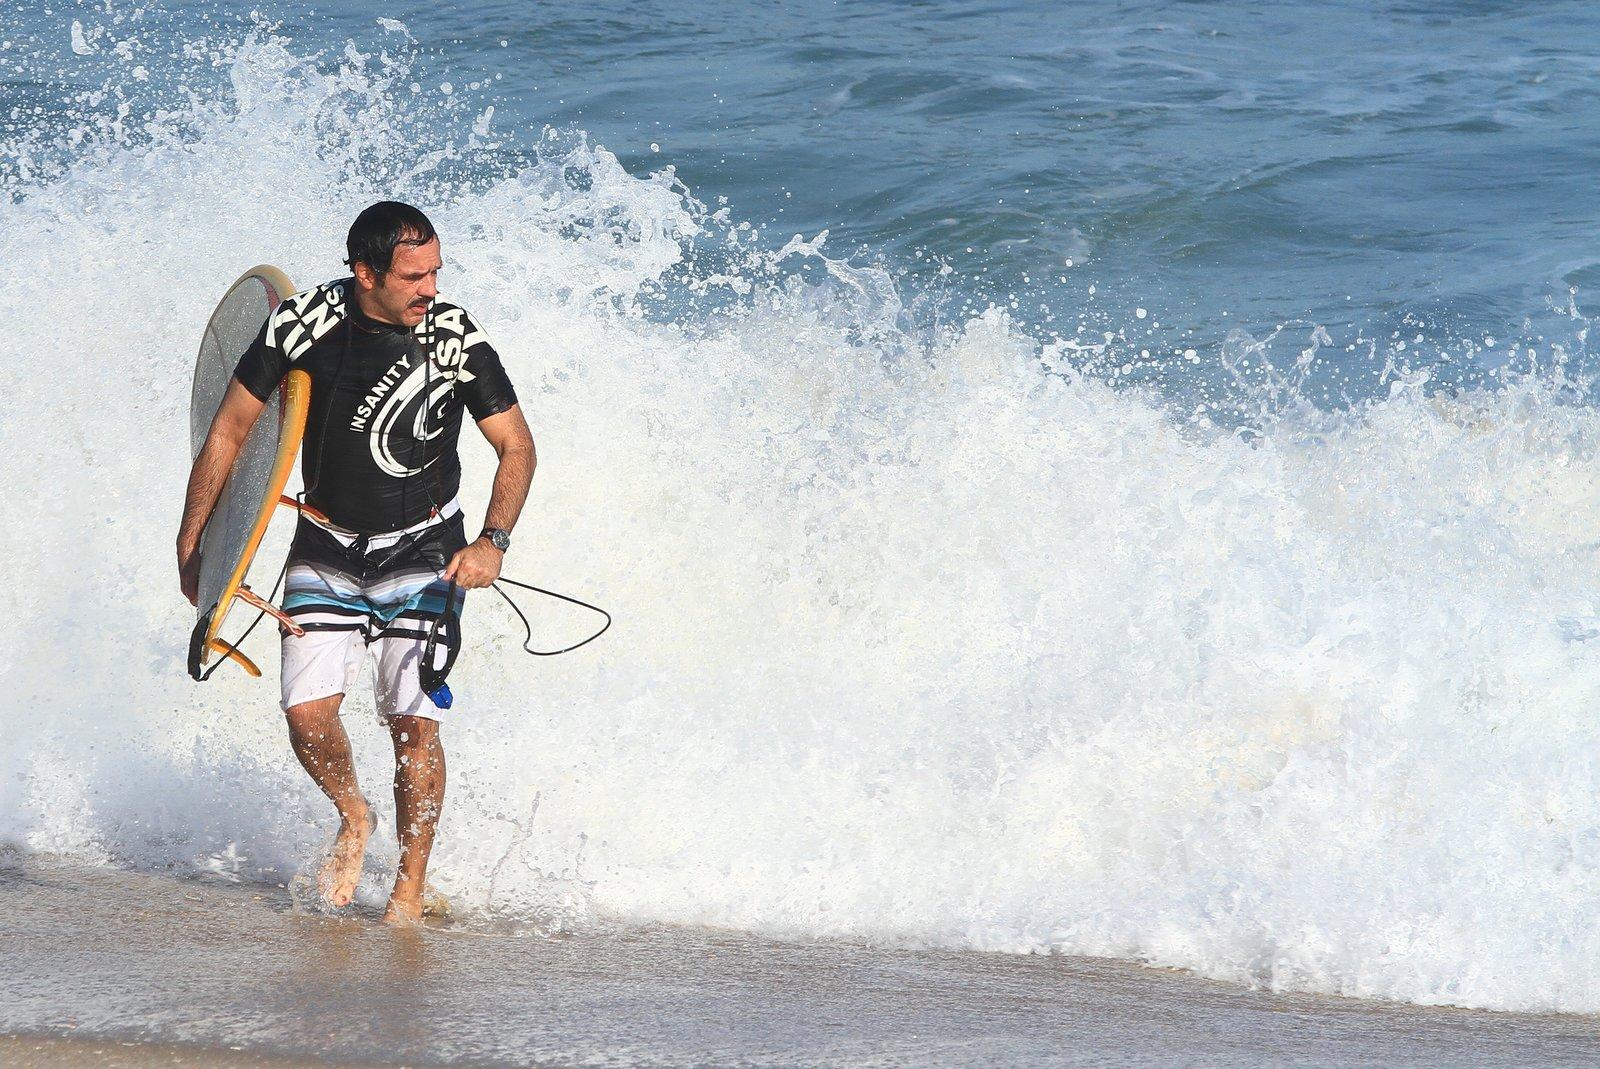 http://s.glbimg.com/jo/eg/f/original/2012/07/22/12-img_3771.jpg